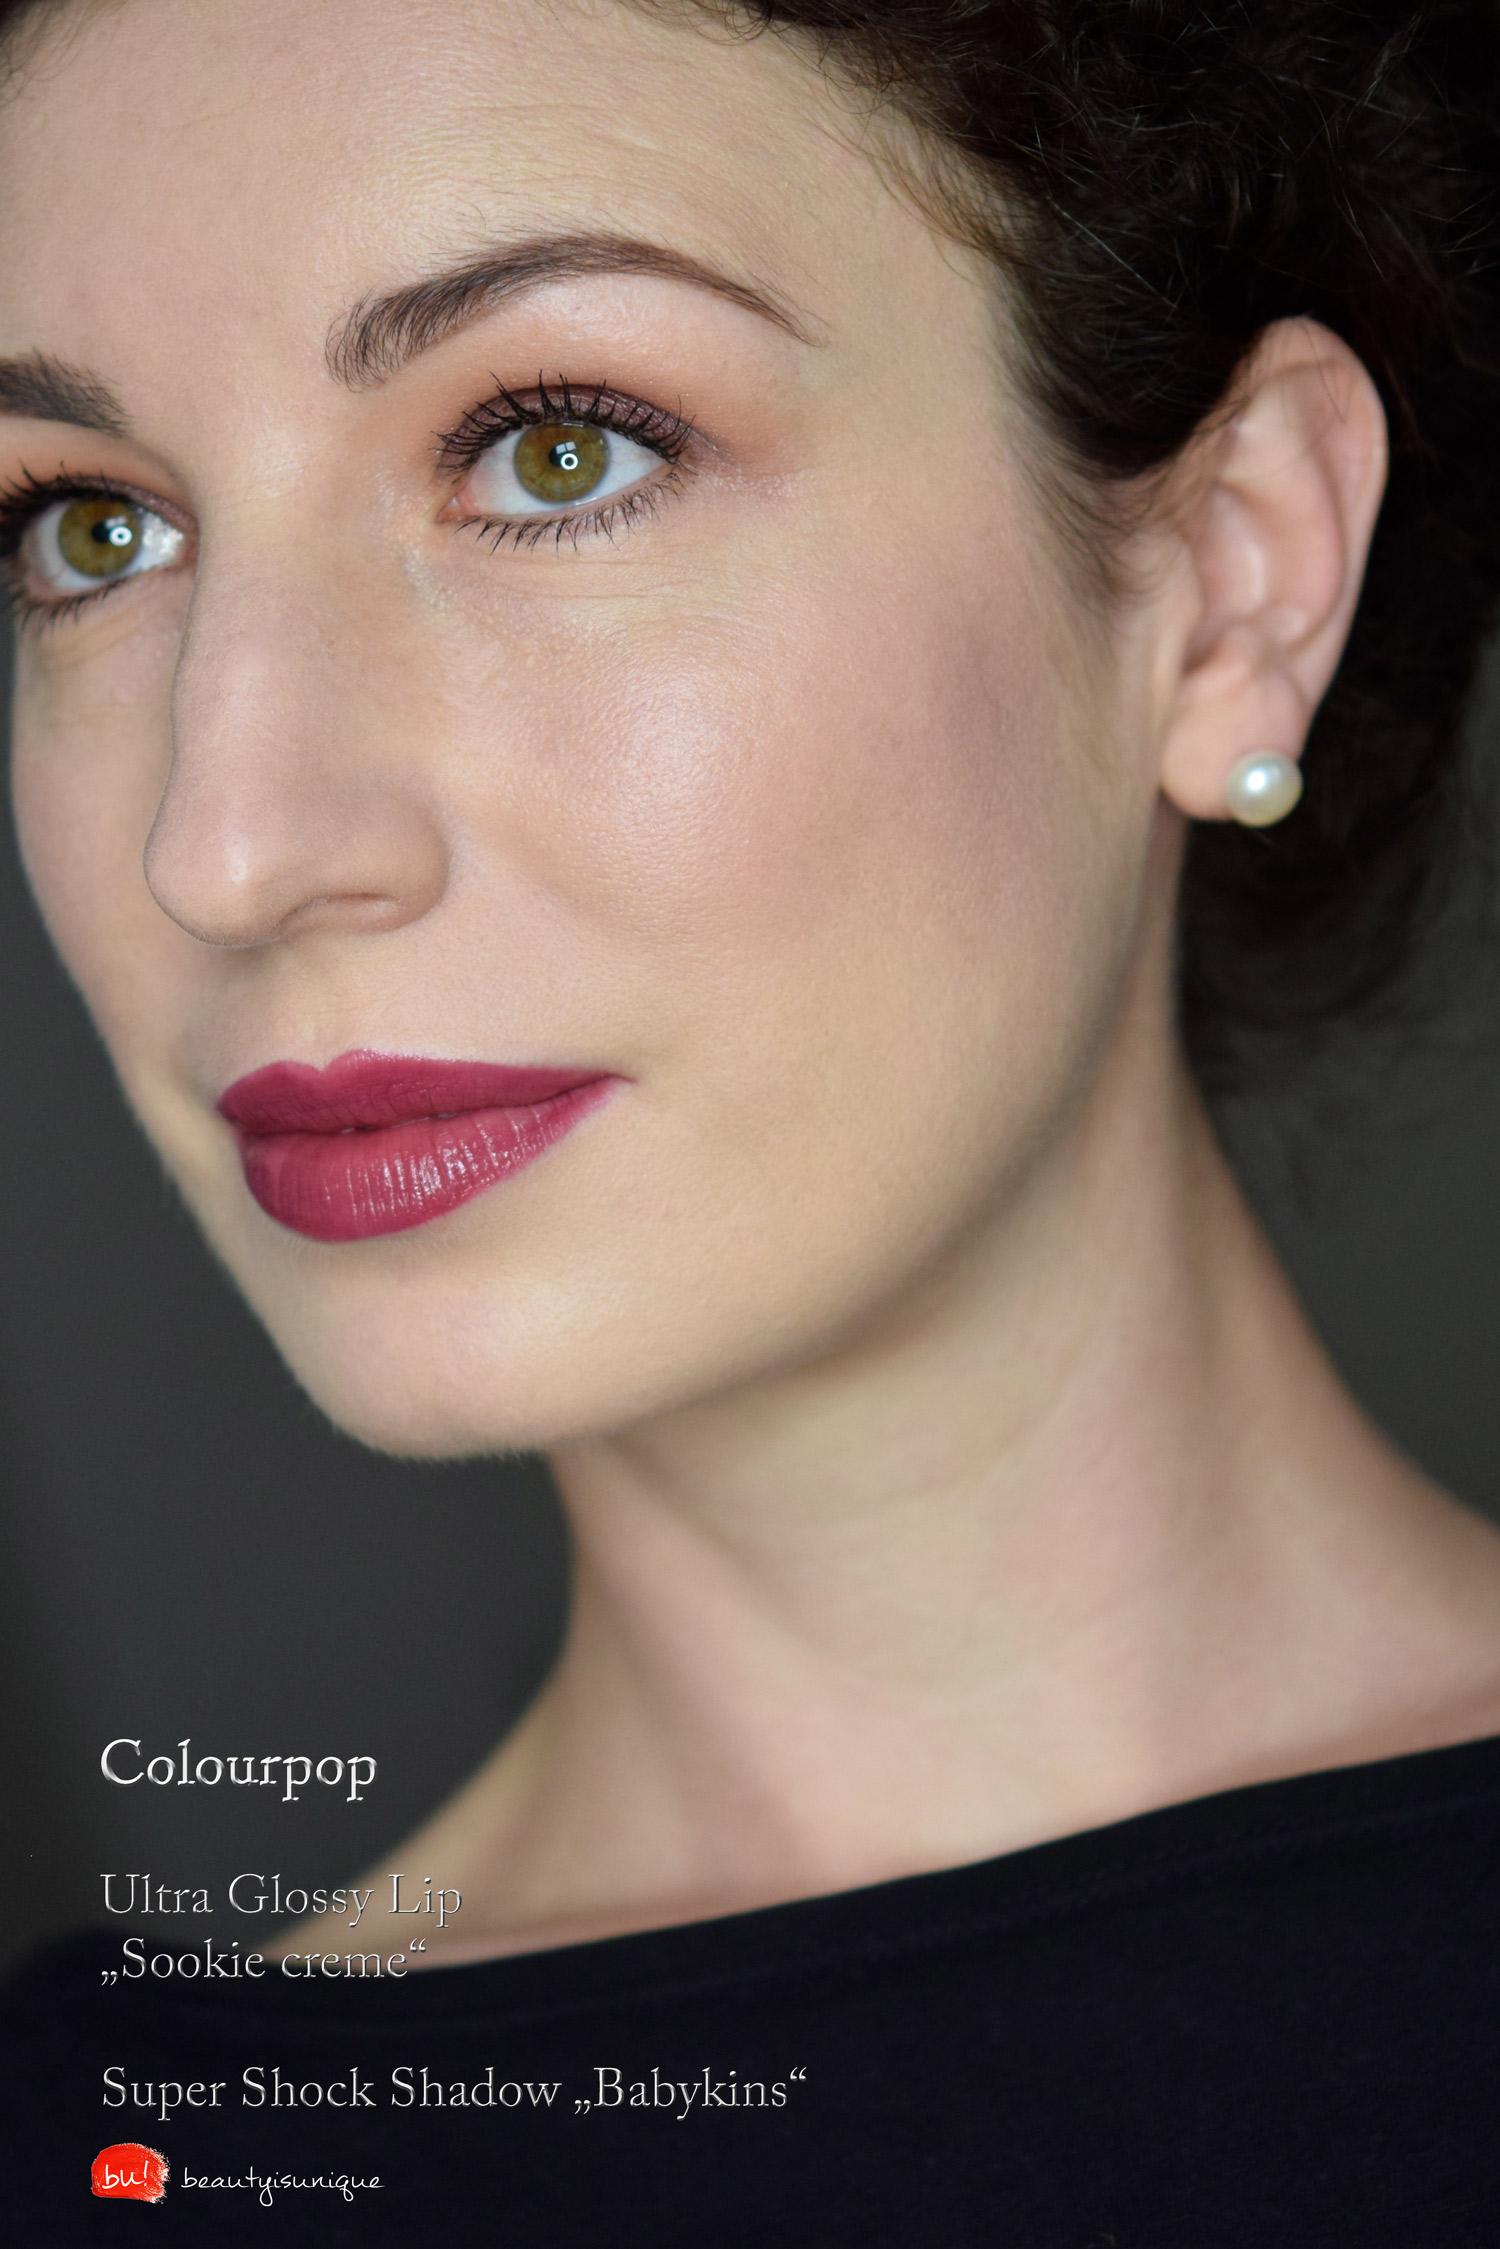 Colourpop-ultra-glossy-lip-sookie-swatch